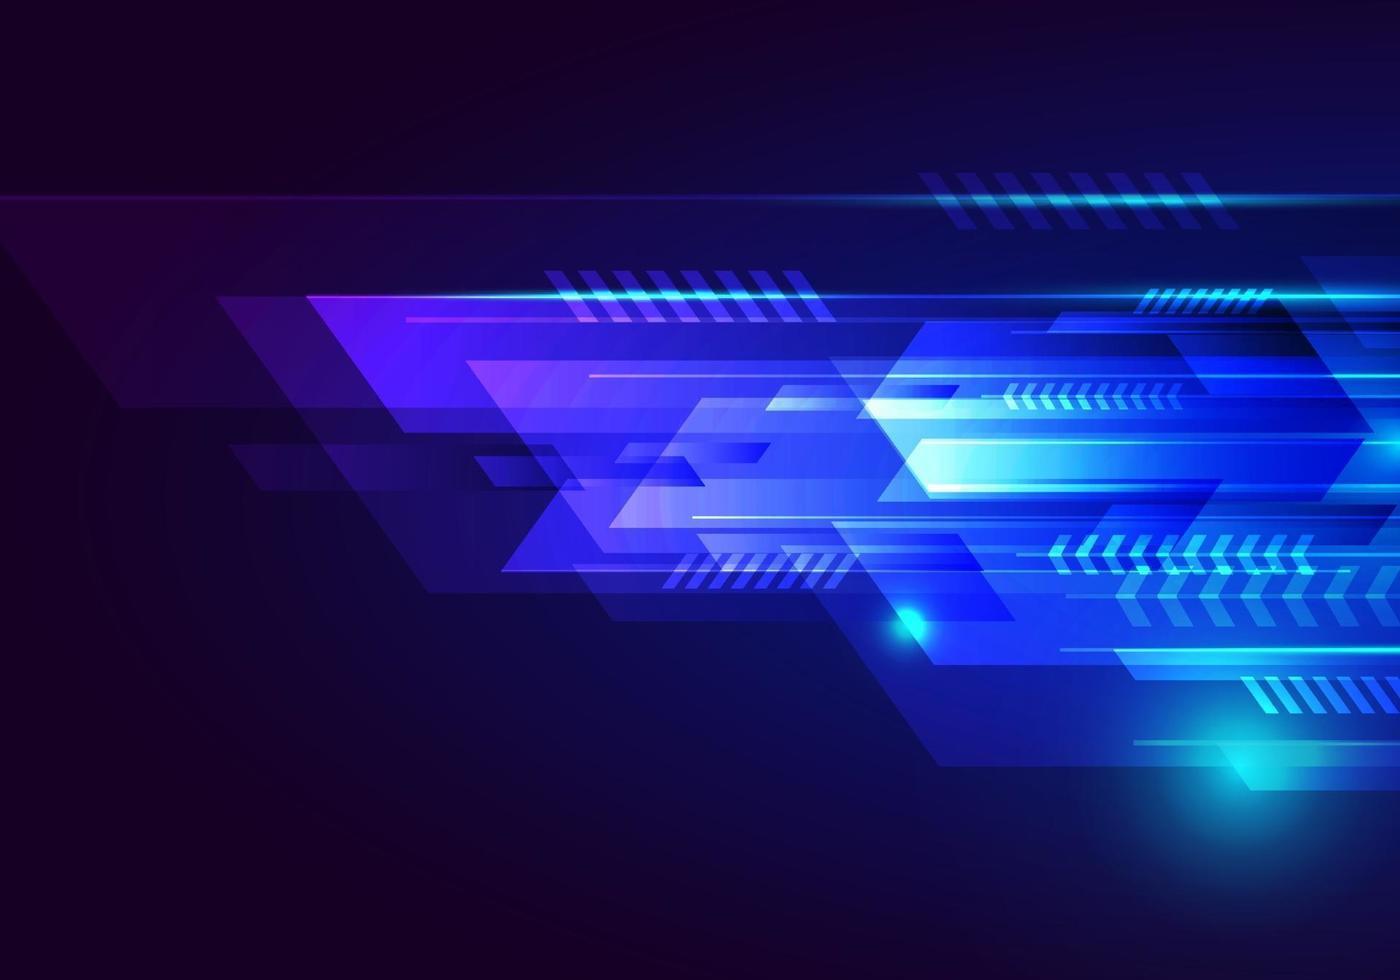 webabstract technologie futuristisch ontwerp blauwe geometrische streeplijnen overlappende lagen decoratie lichteffect op donkere achtergrond. vector